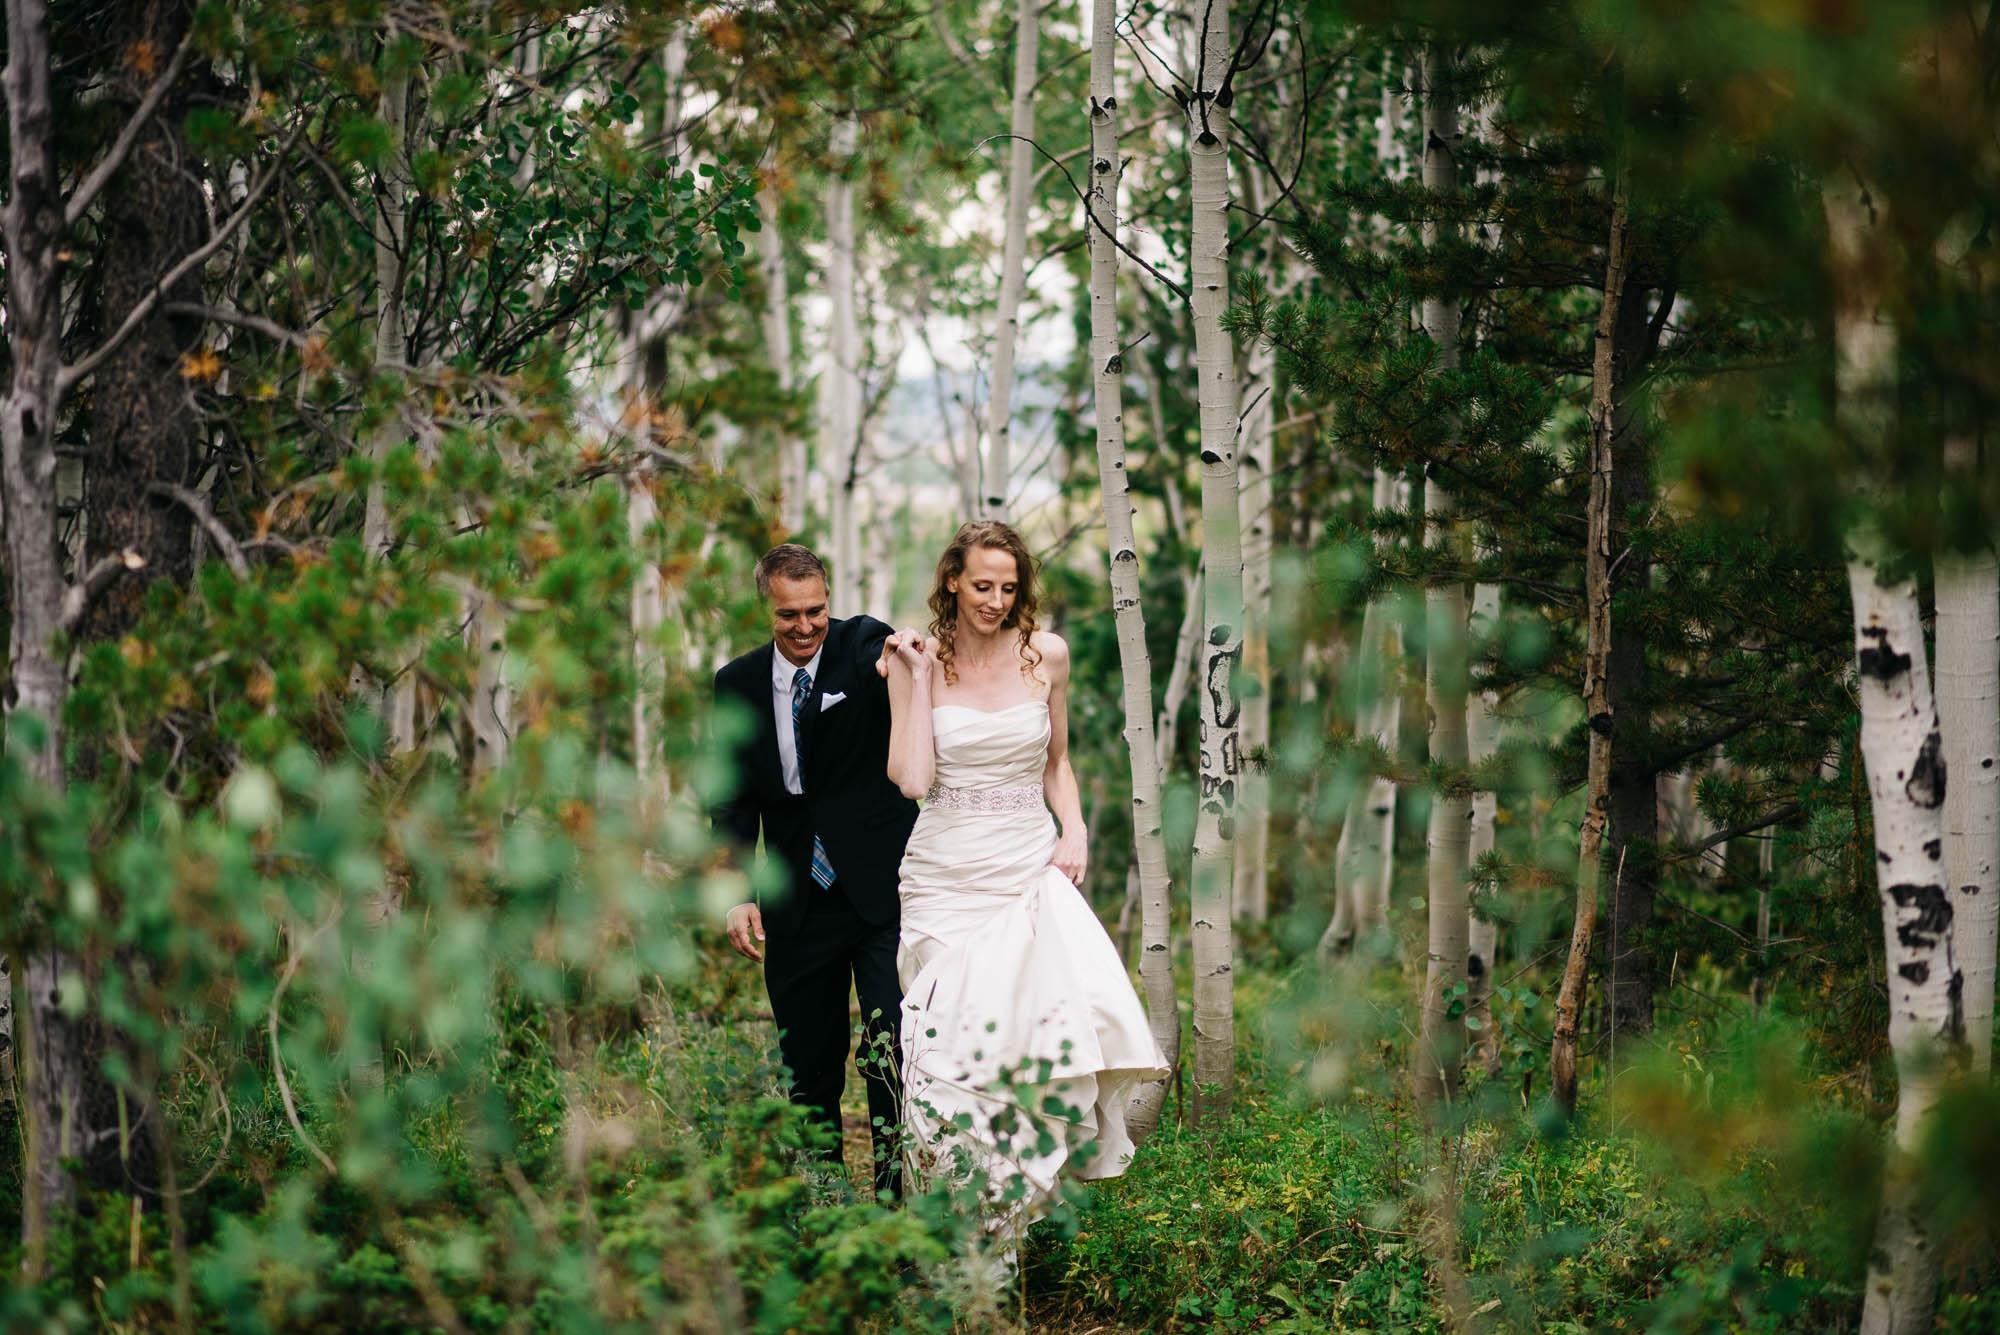 34elopement-photographer-colorado-snow-mountain-ranch-wedding-cynthia&chris-married1340.jpg